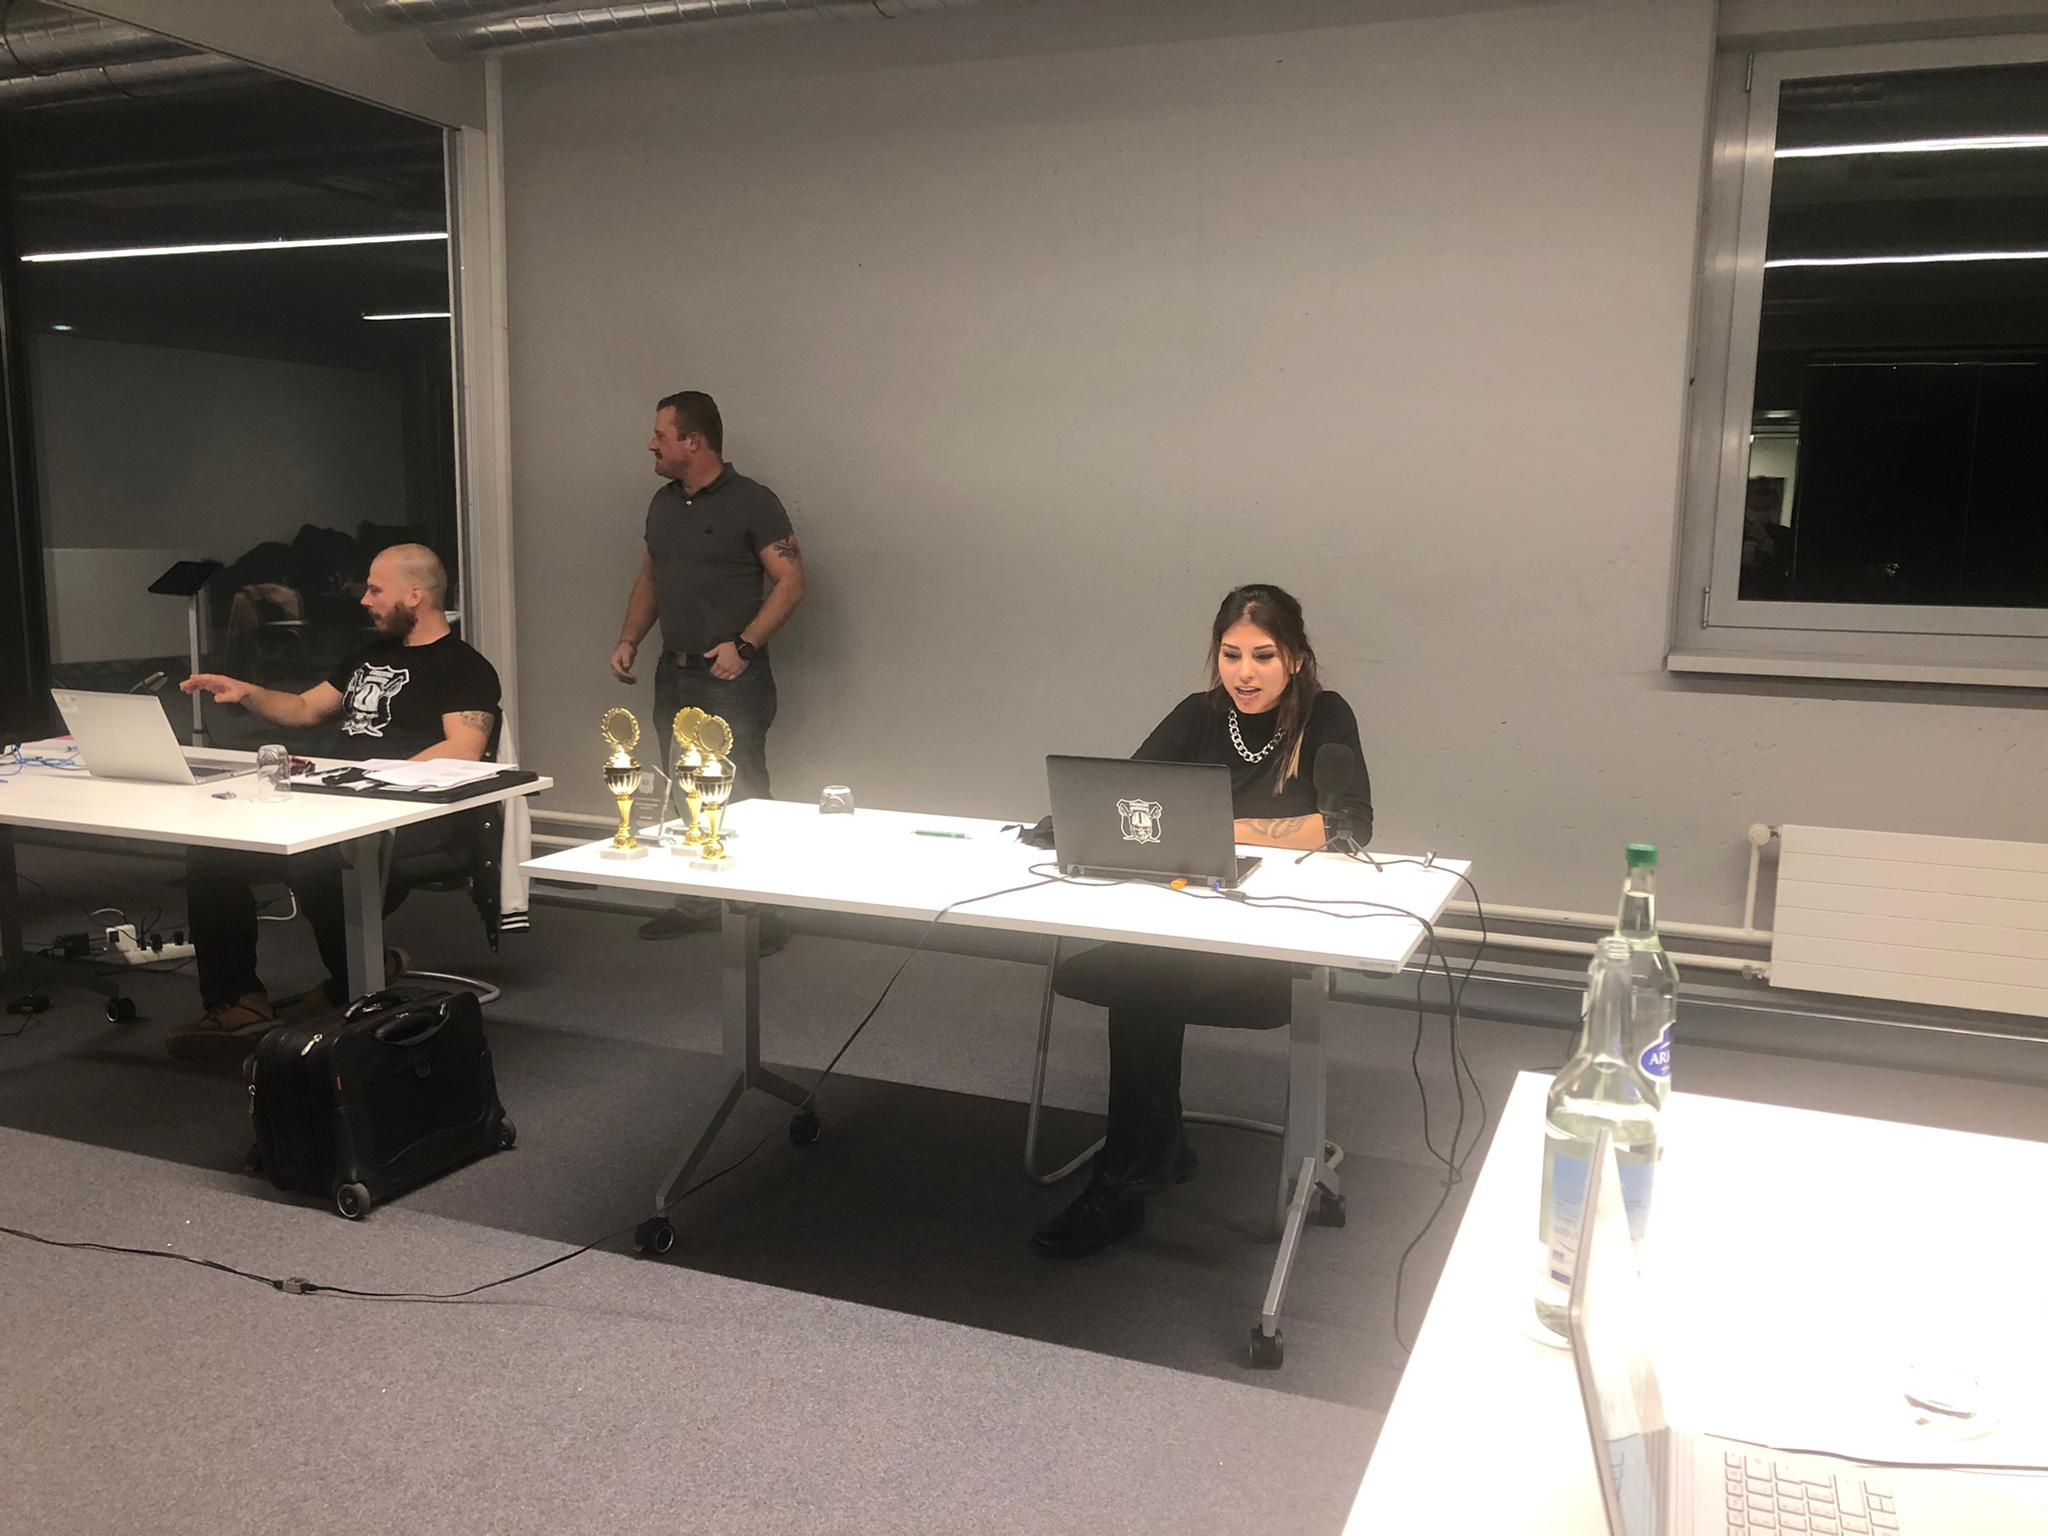 Die HV im Remoteverfahren, dank www.ebcom.ch